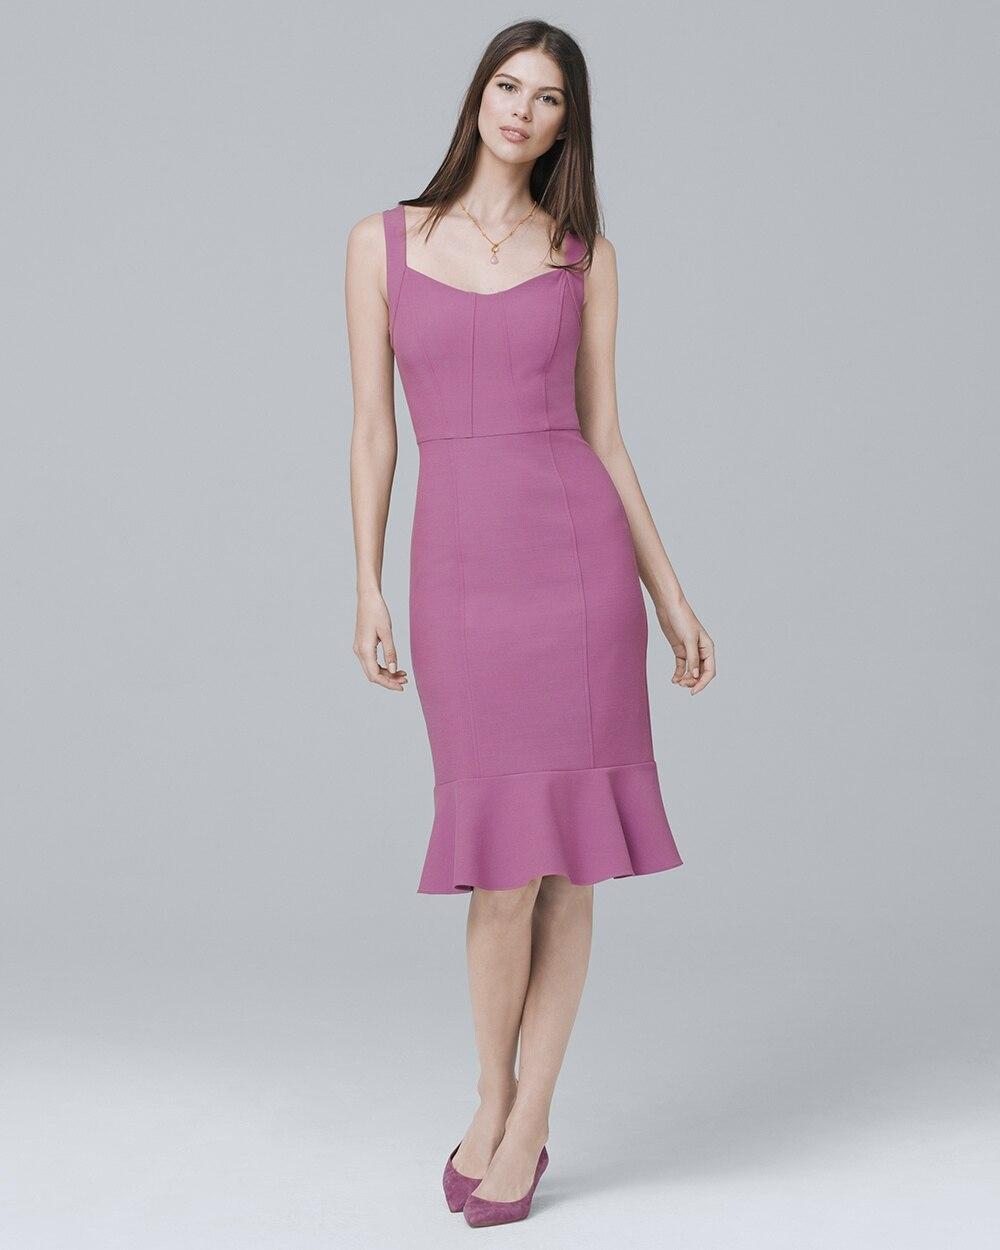 a993f285f5 Body Perfecting Flounce Hem Sheath Dress - White House Black Market